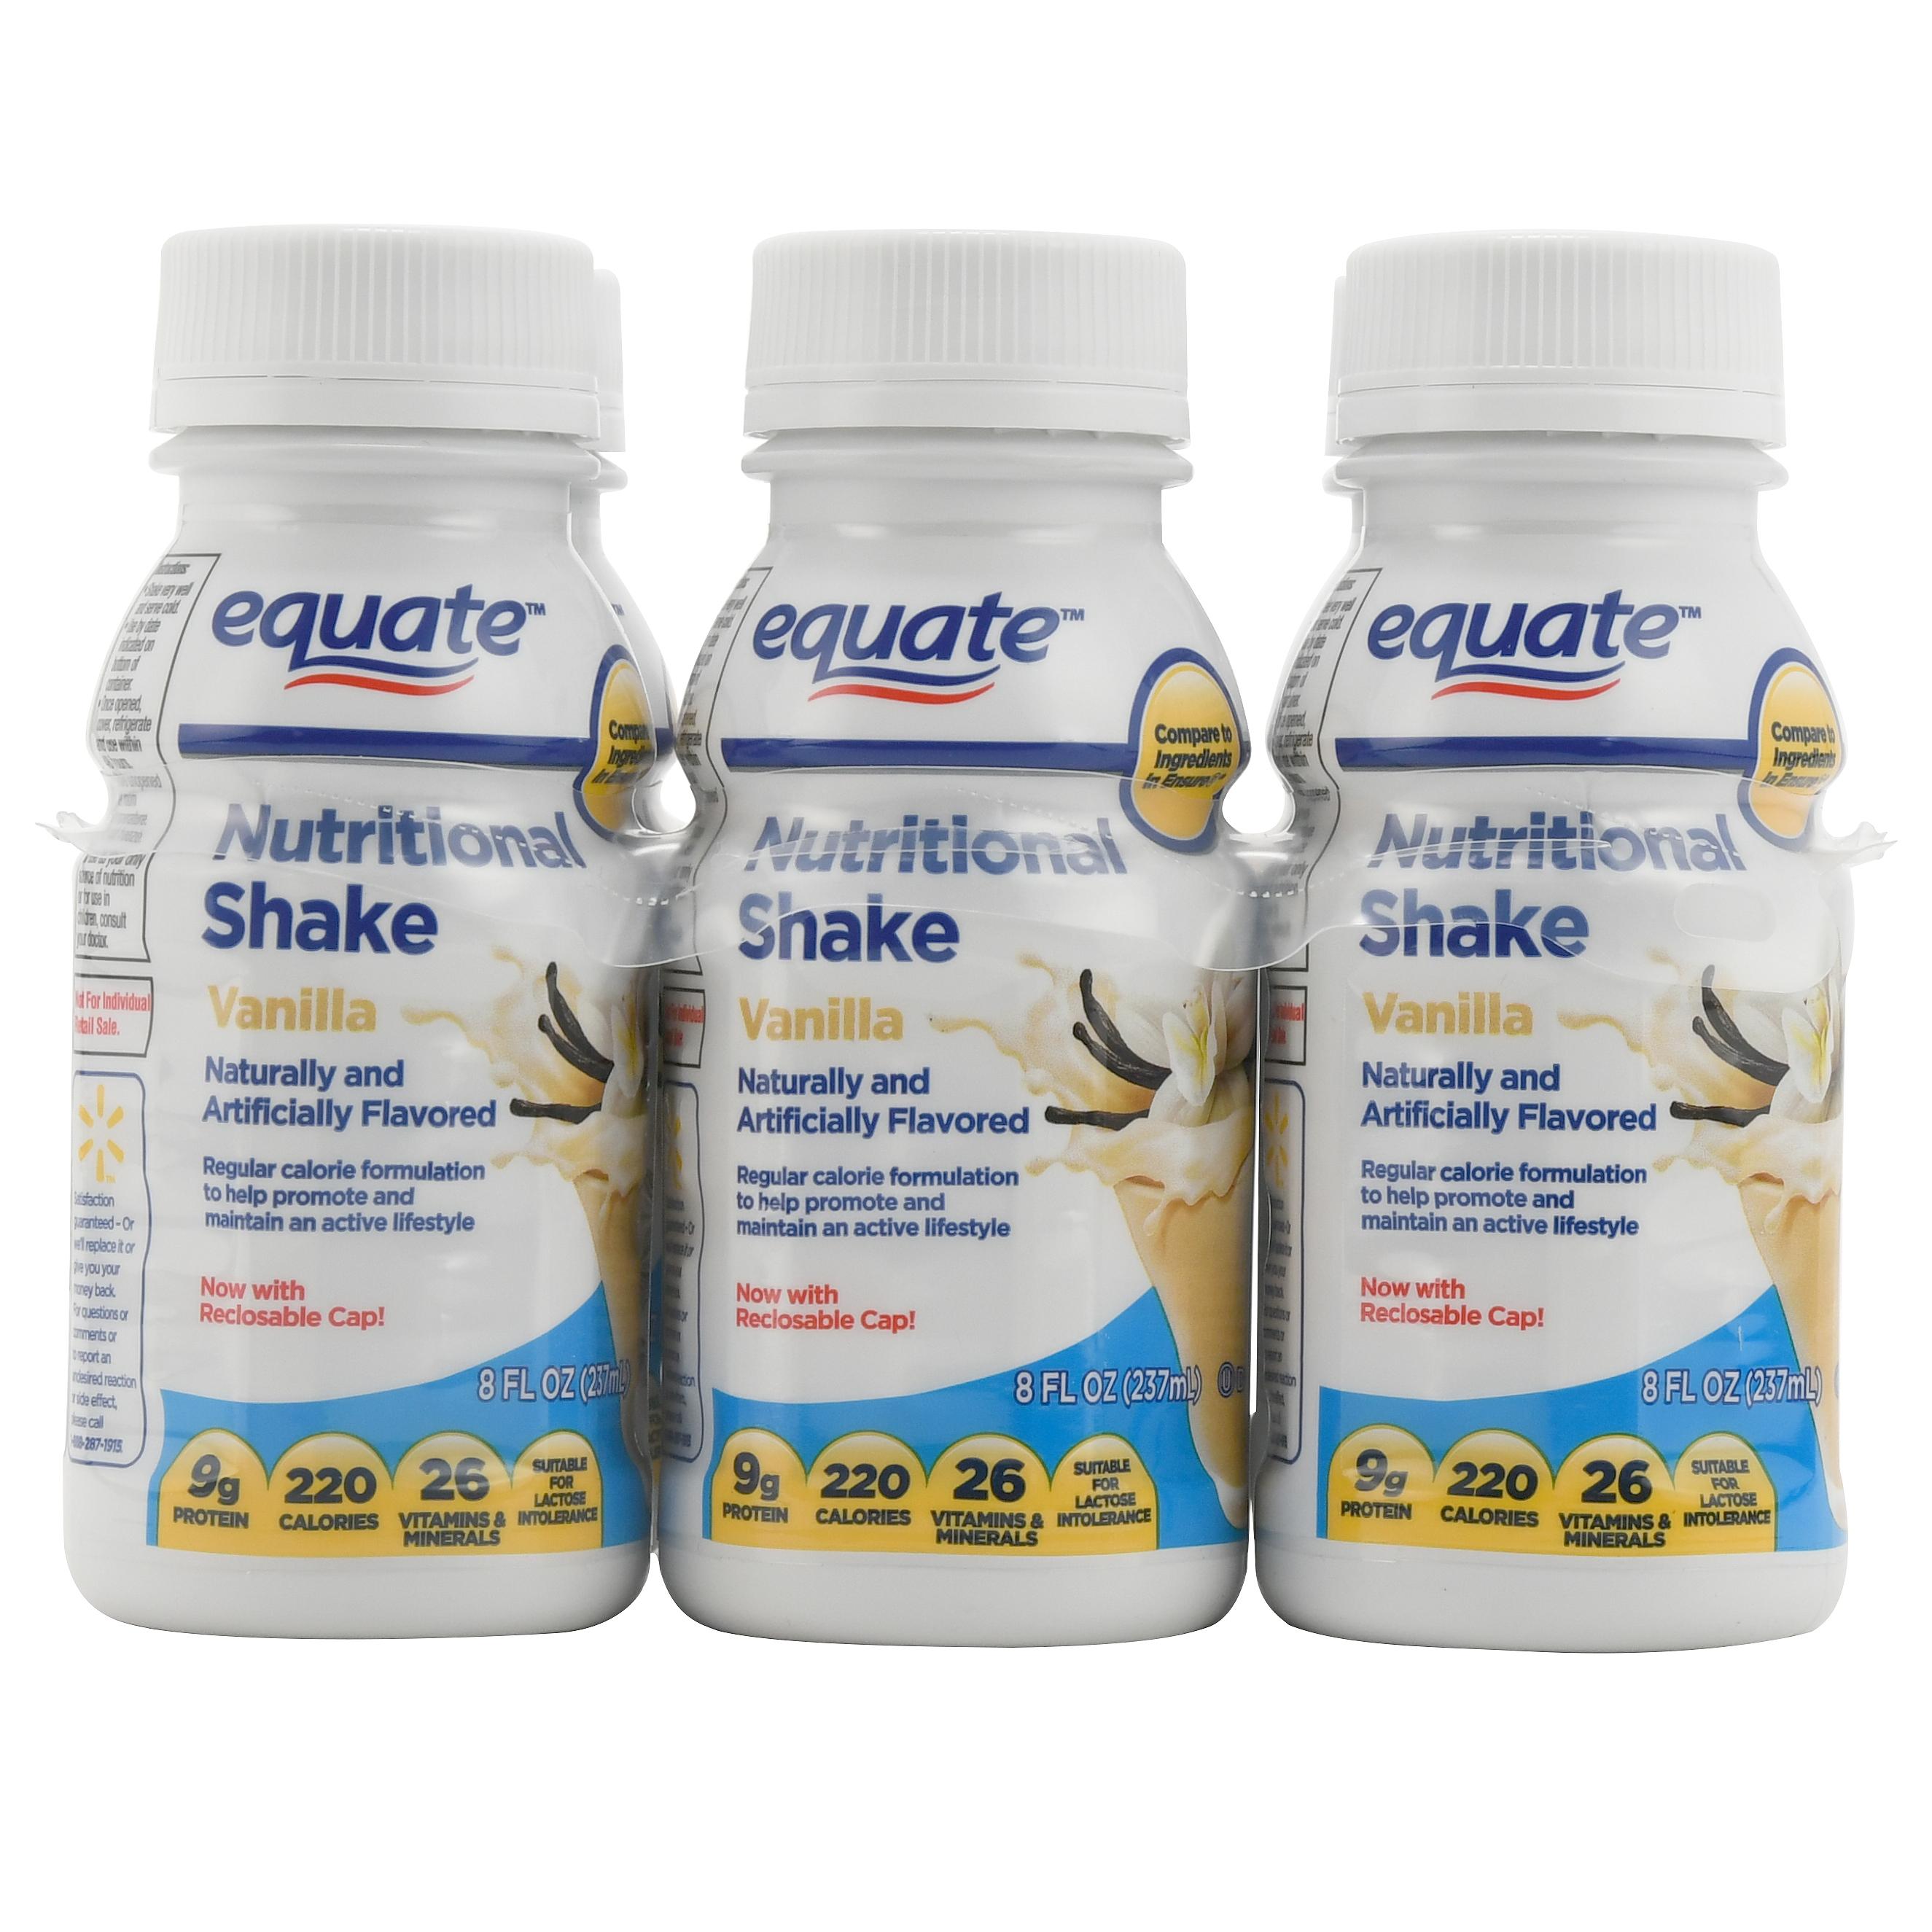 Equate Vanilla Nutritional Shake, 8 Fl Oz, 6 Ct